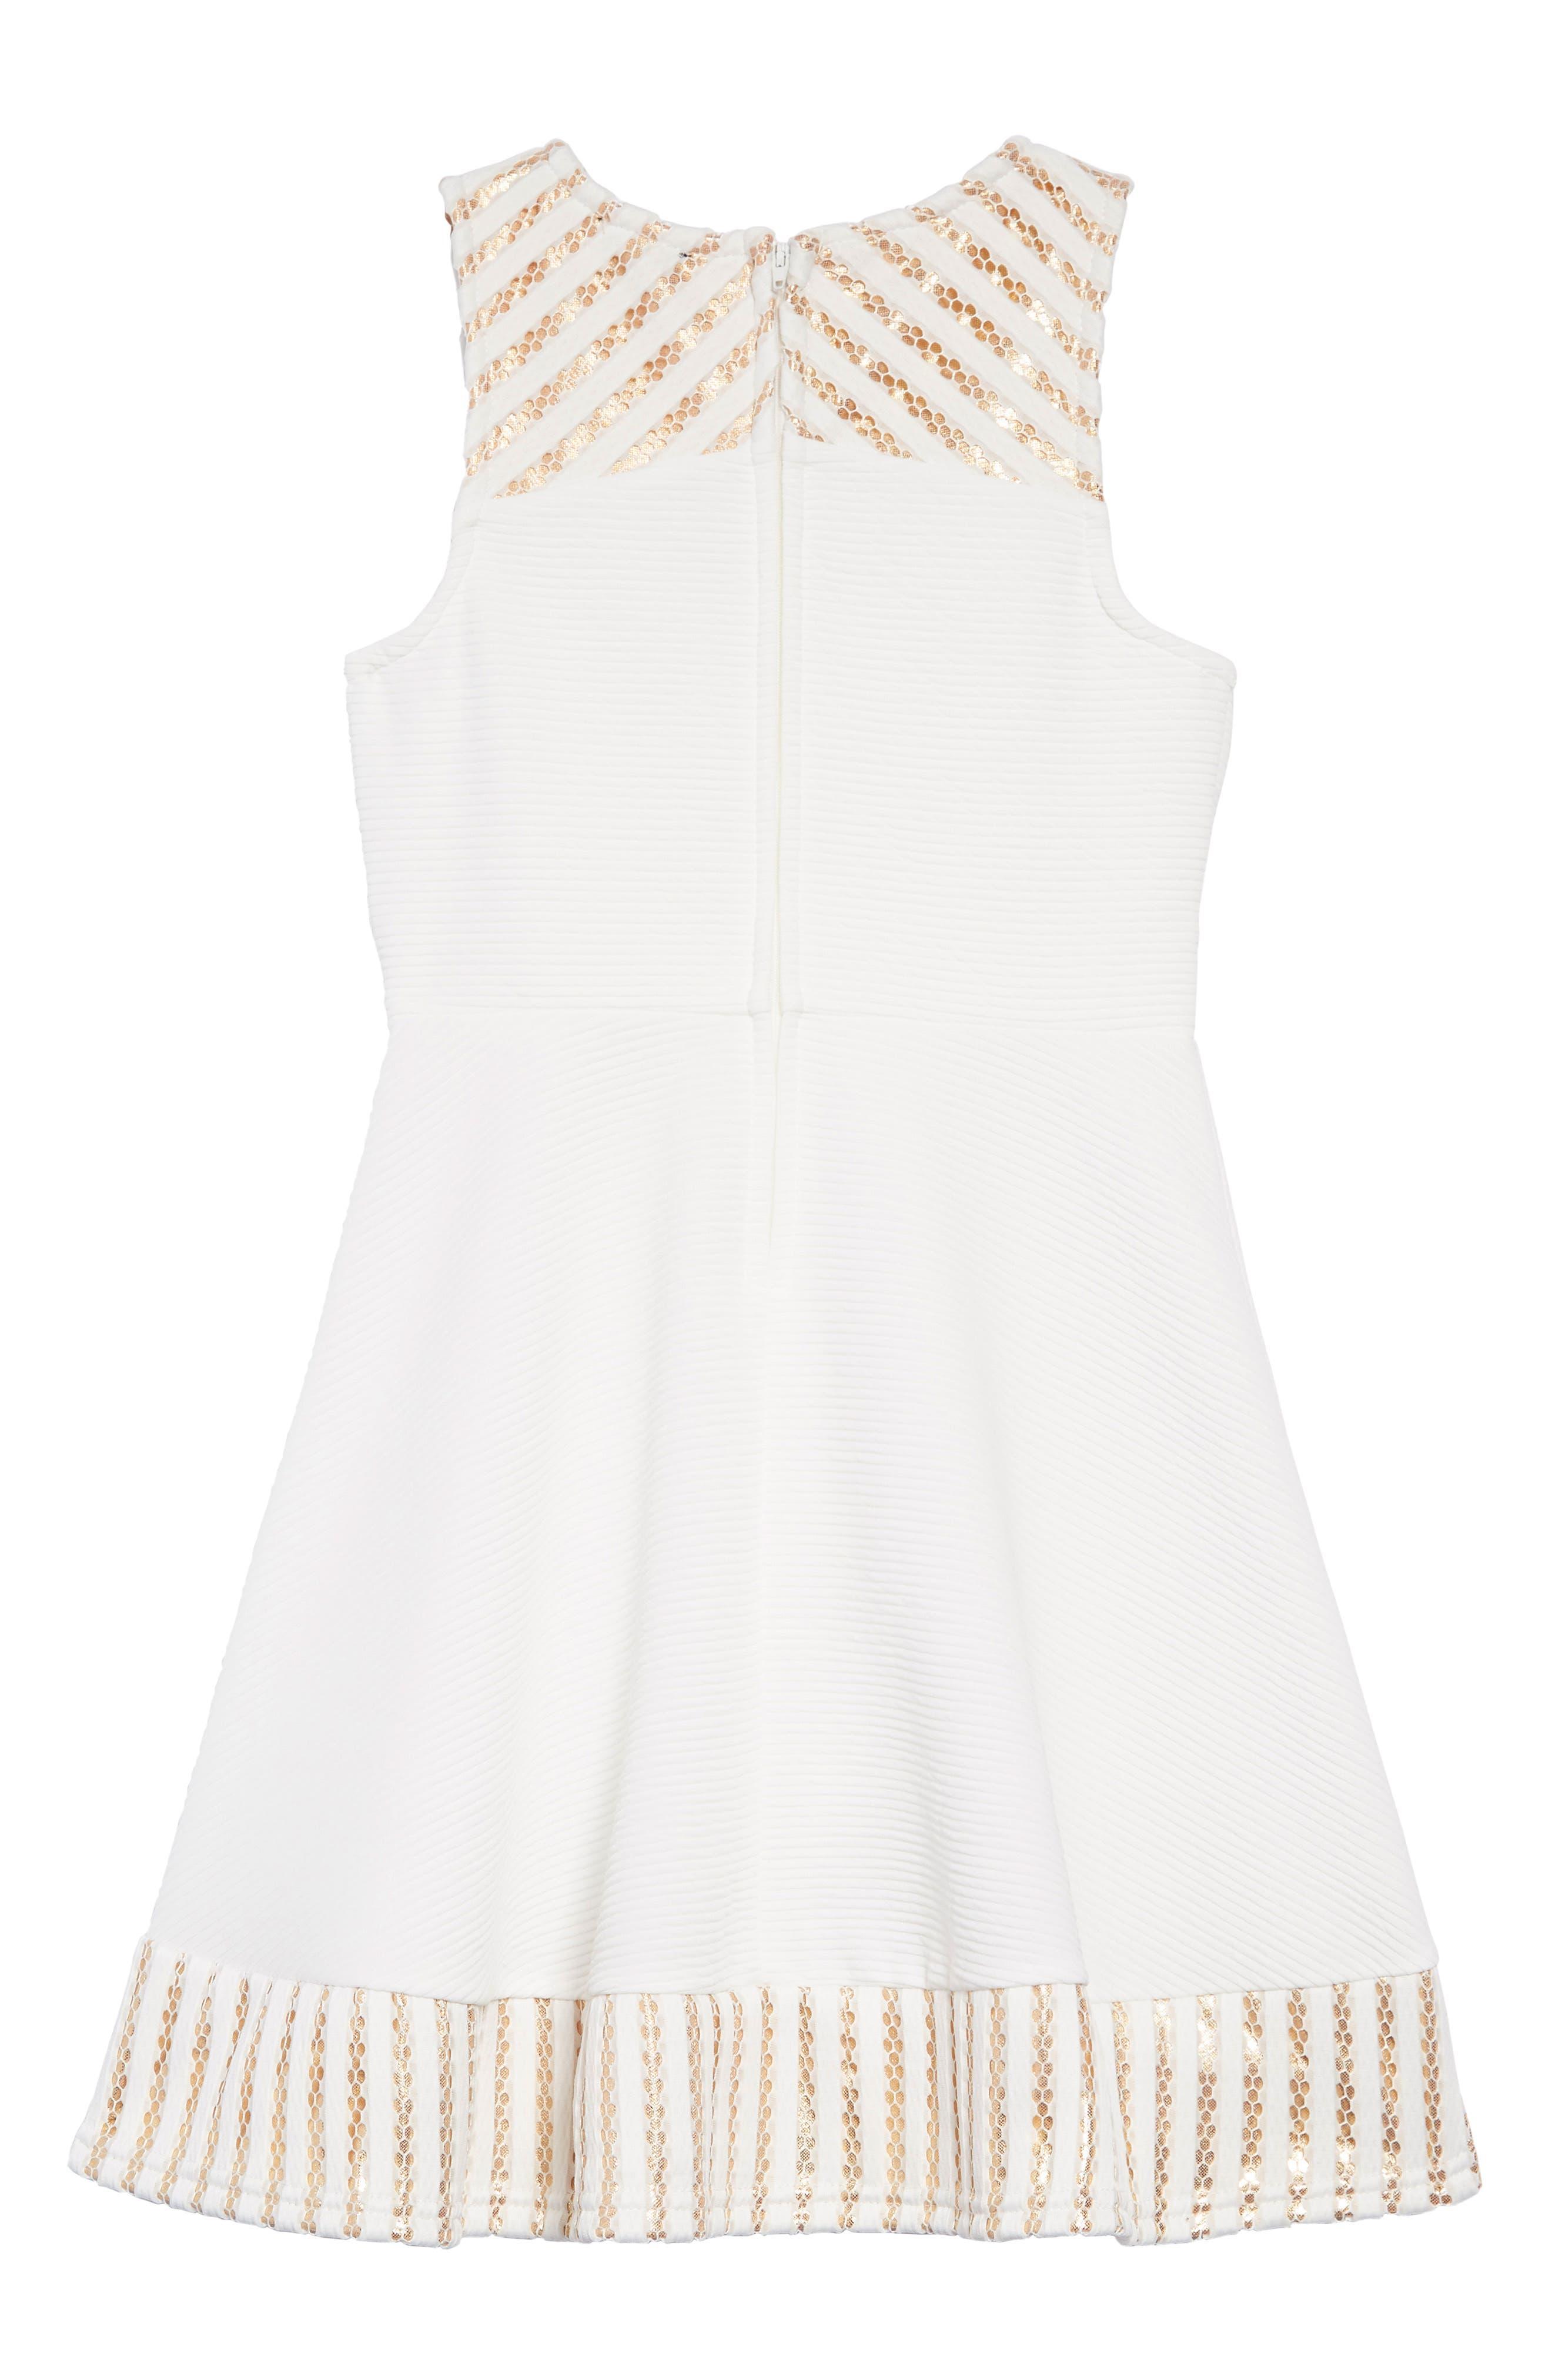 ZUNIE, Metallic Trim Ribbed Skater Dress, Alternate thumbnail 2, color, WHITE/GOLD